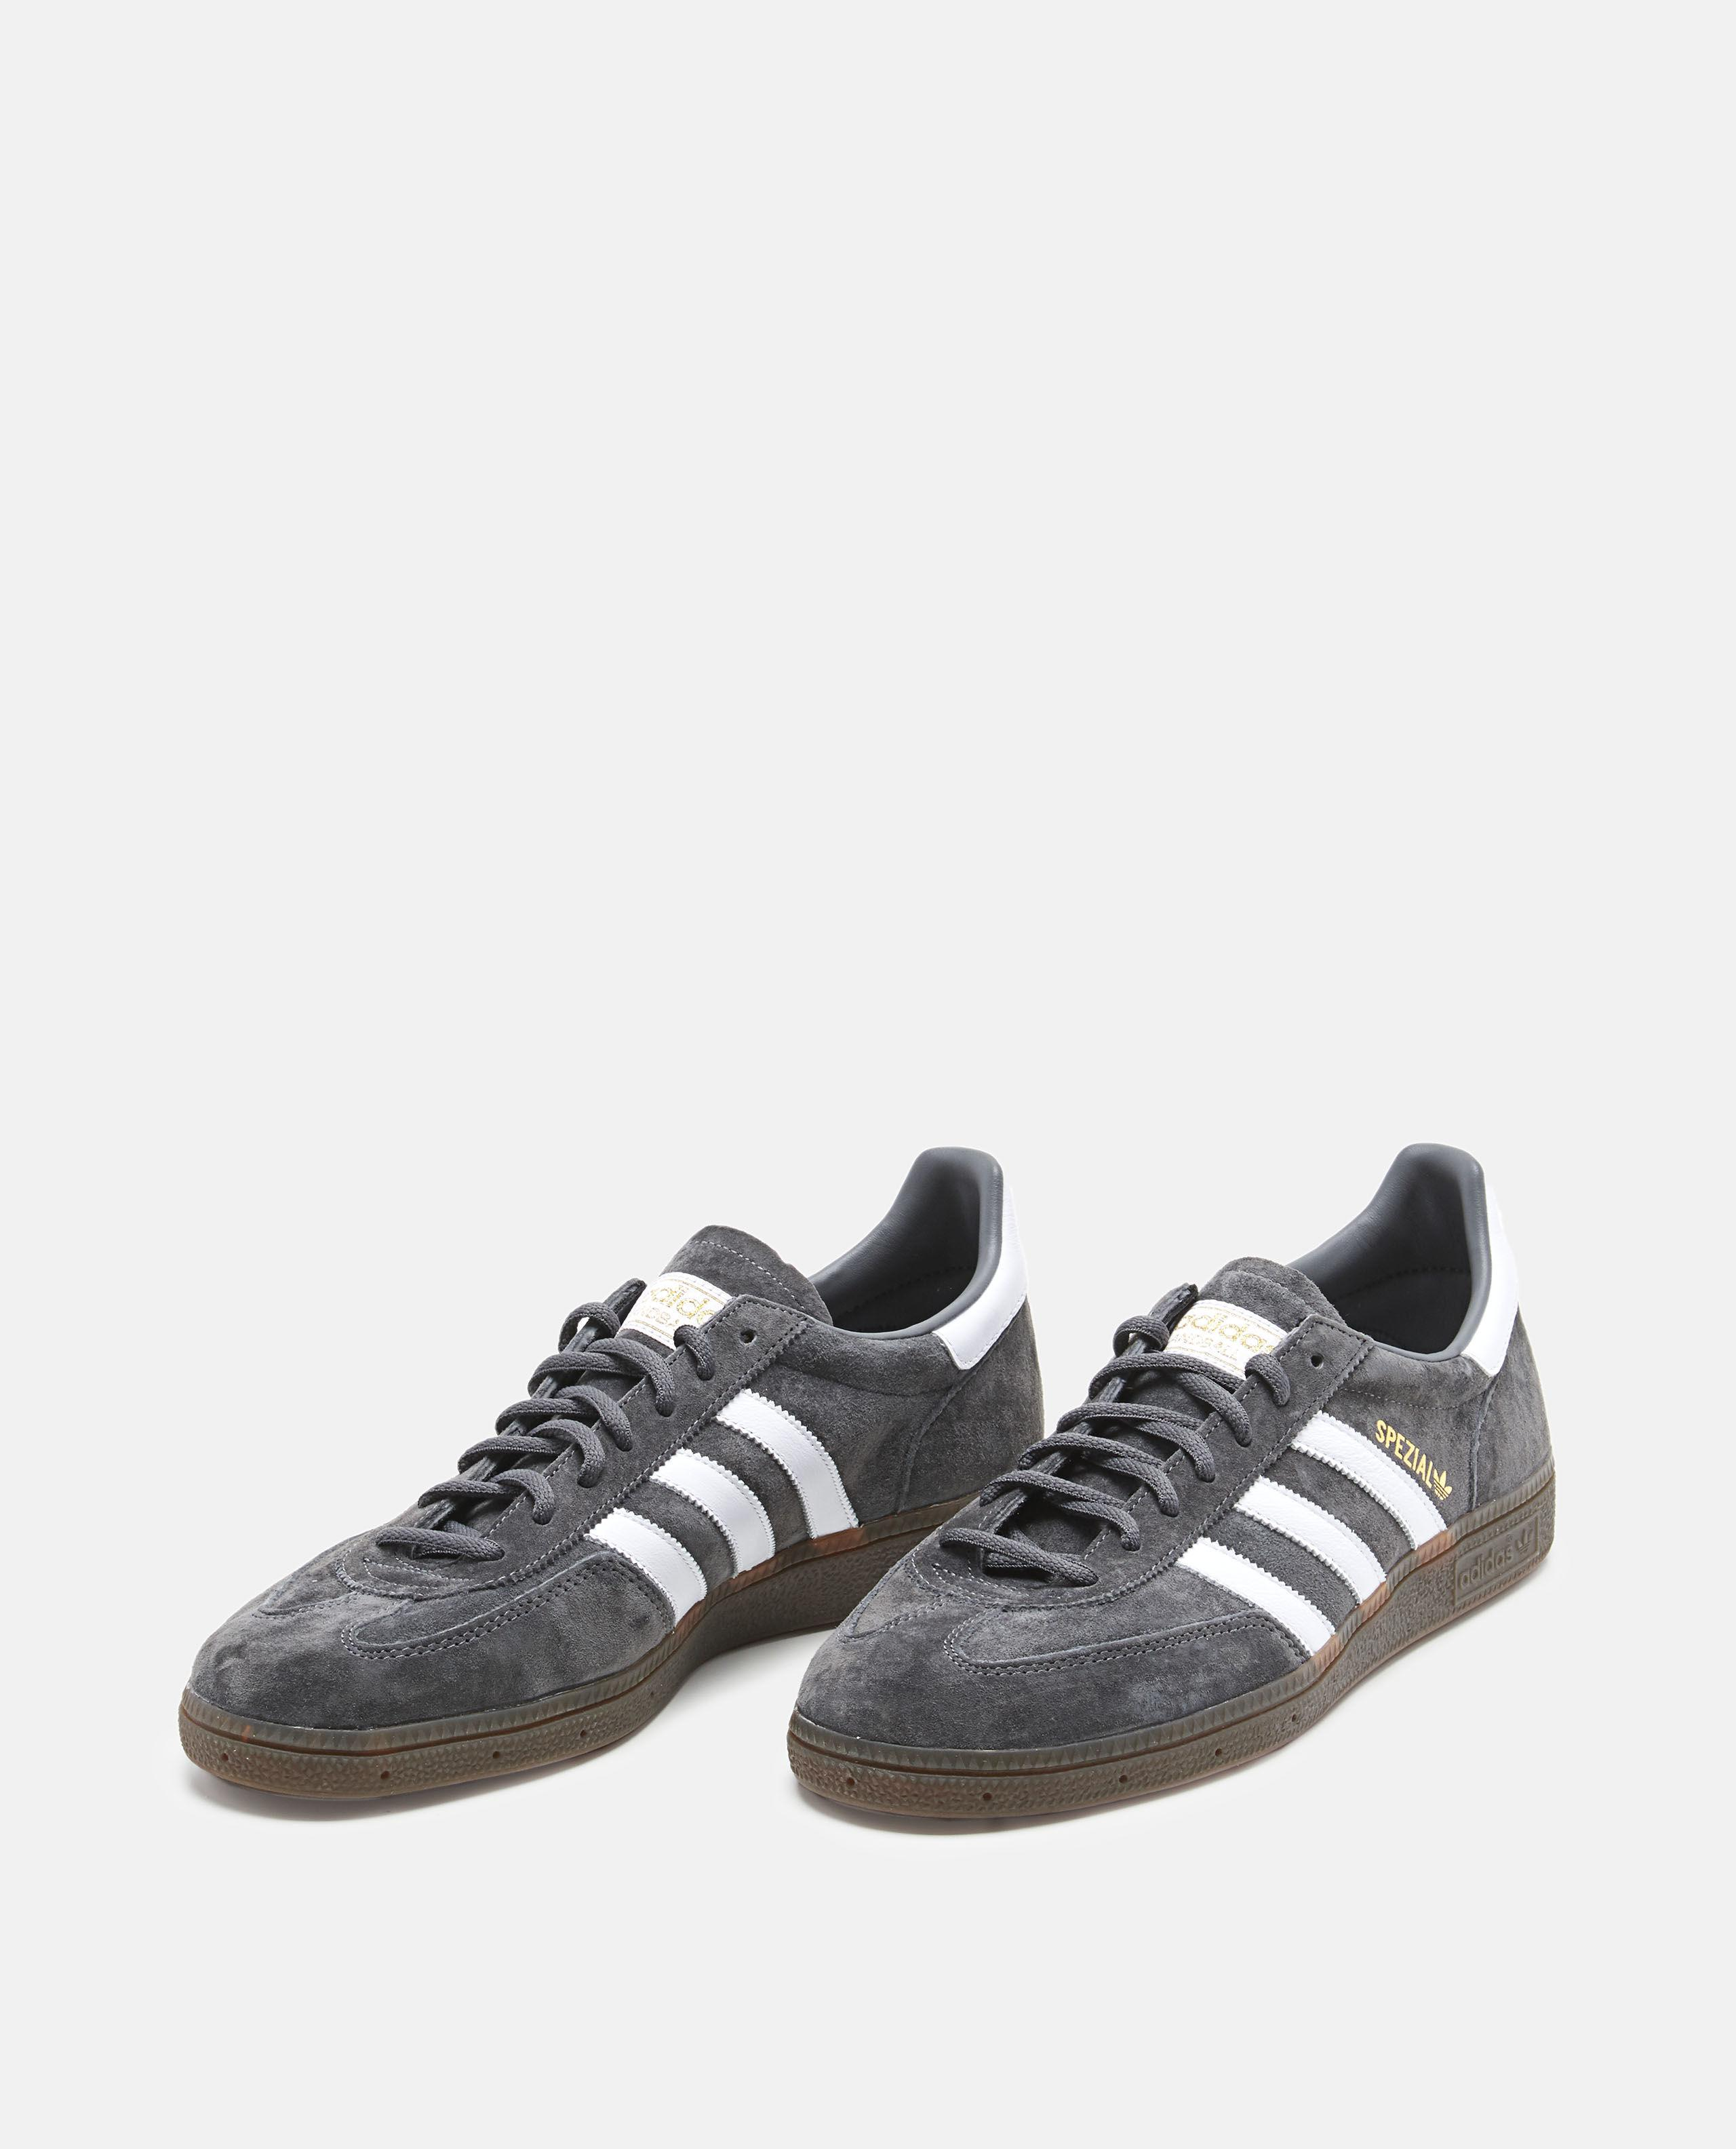 1a90f09ffe05 adidas Originals Spezial Sneaker in Gray for Men - Lyst